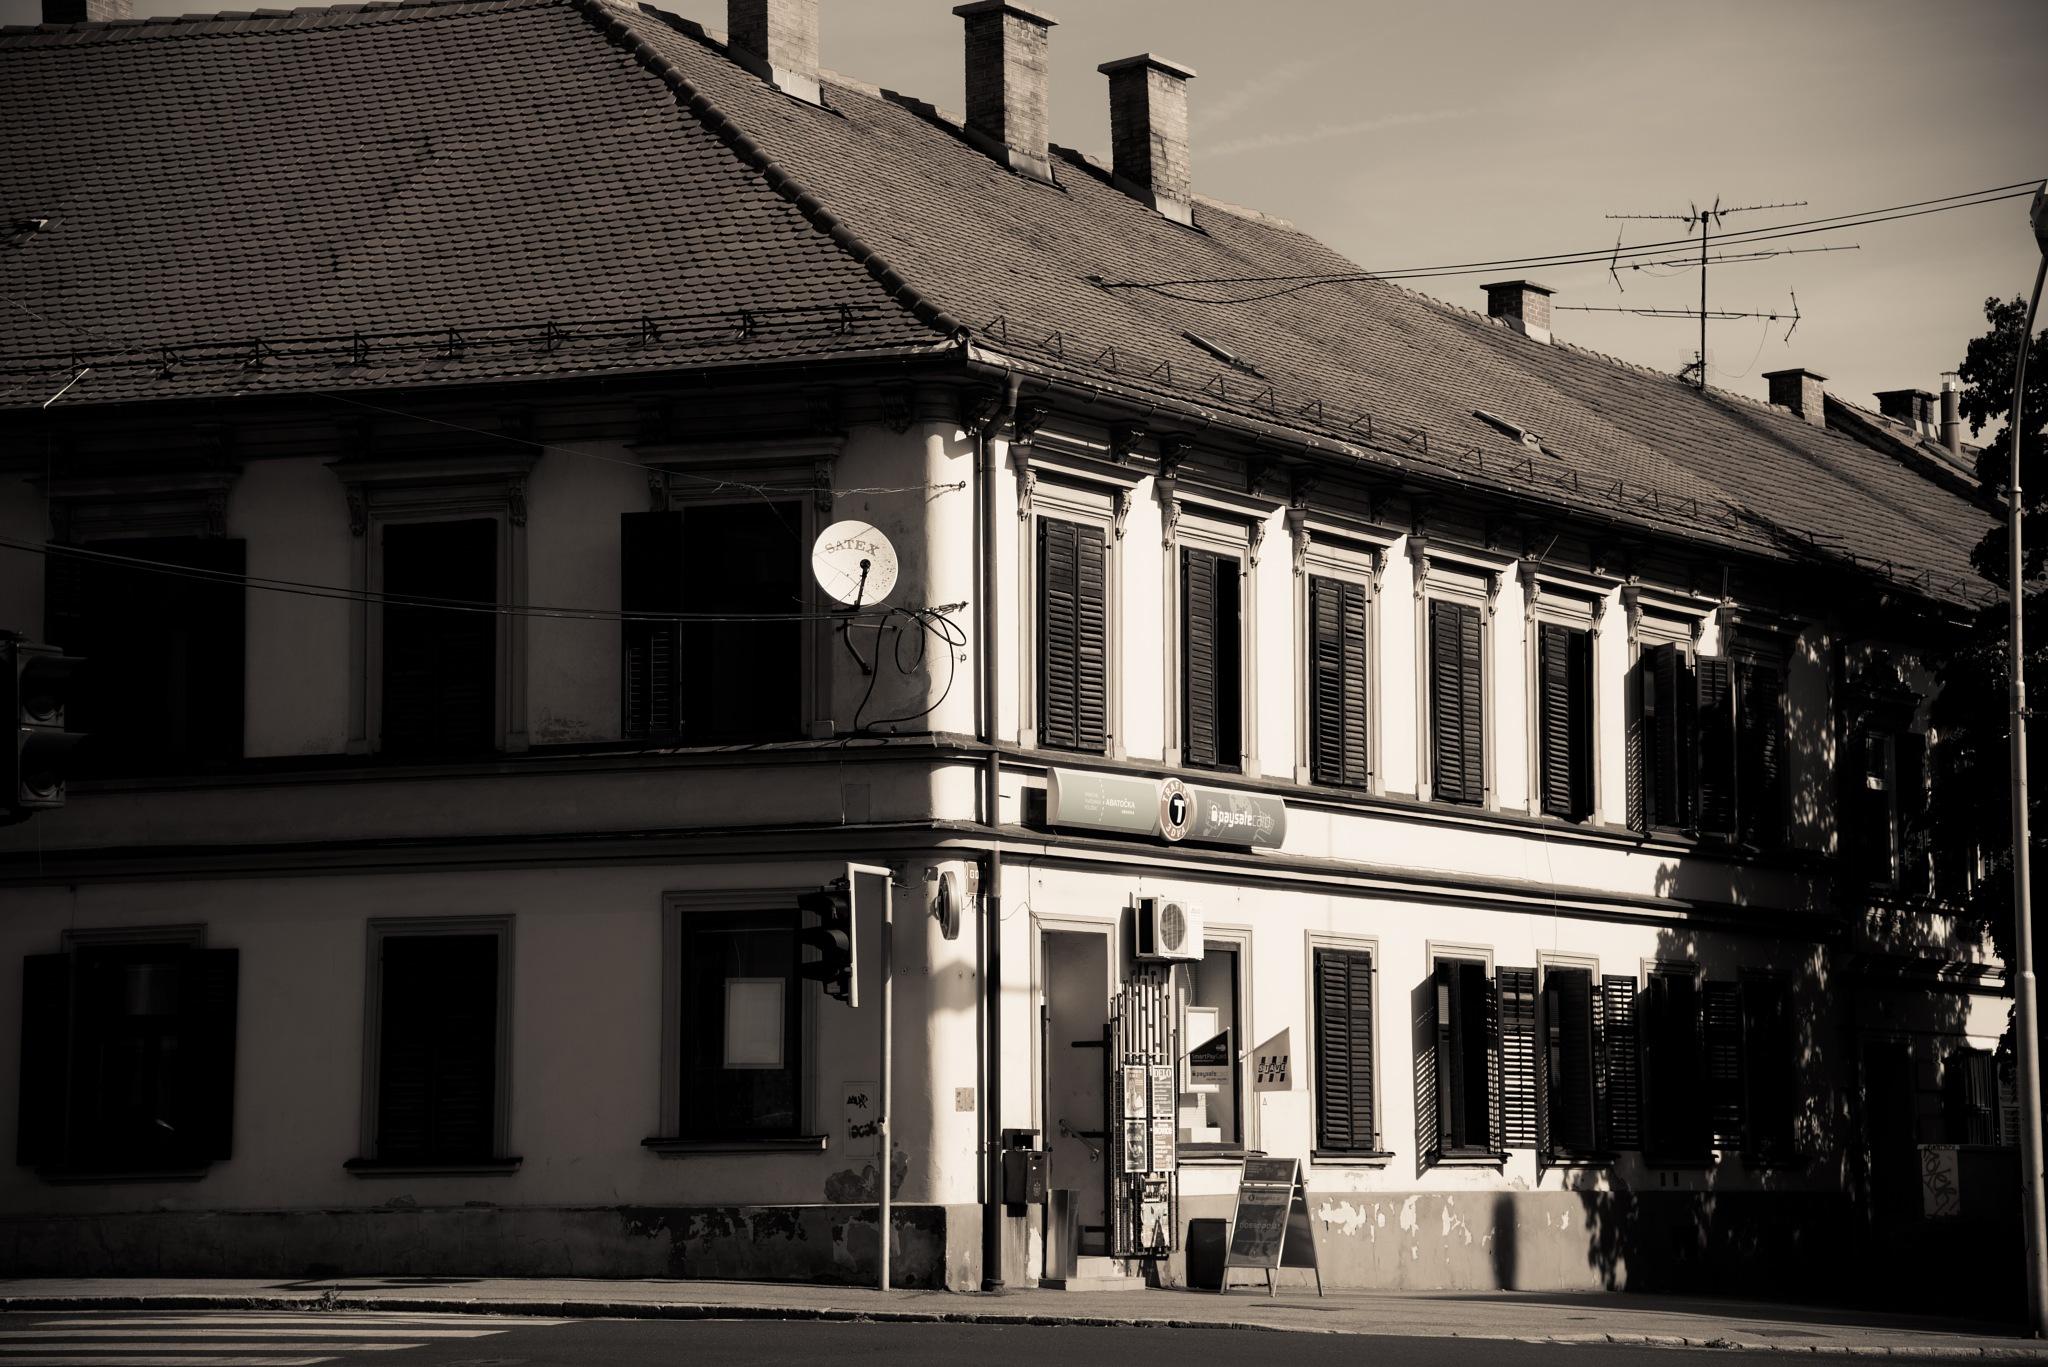 corner by dusanvladimir